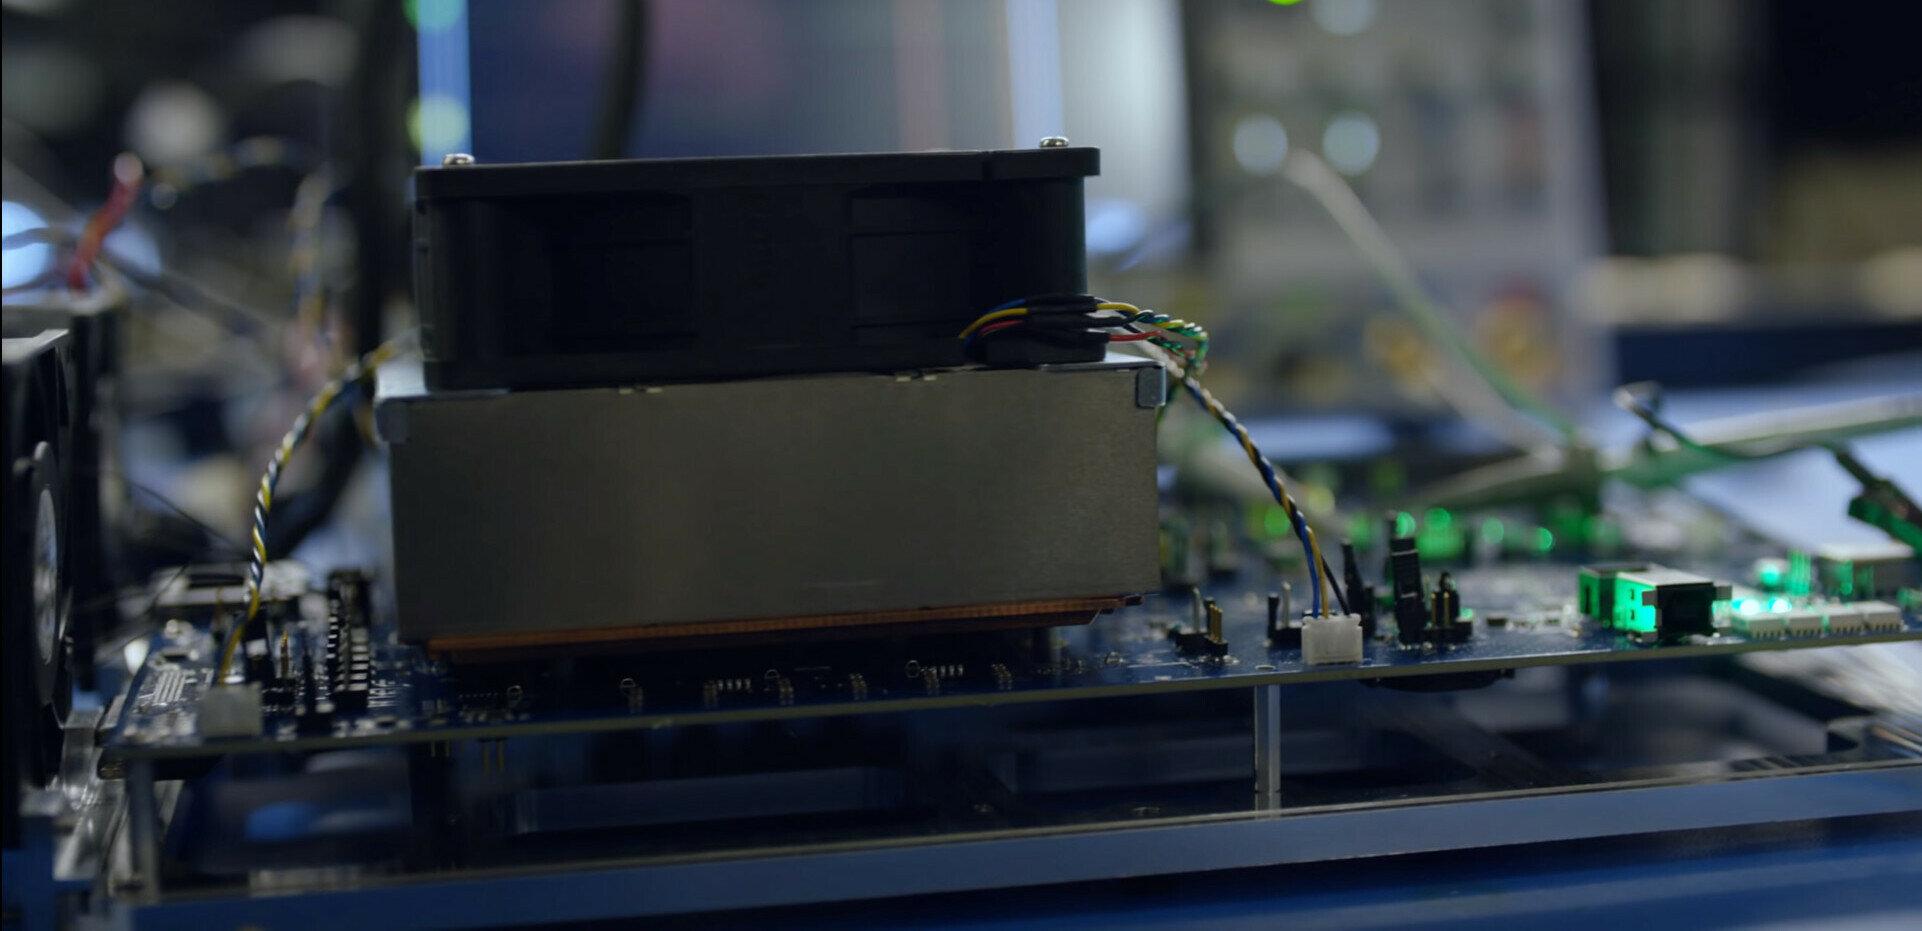 Xbox Scarlett avec 8K, ray tracing, SSD, 120 fps : Microsoft en dit plus sur sa prochaine console